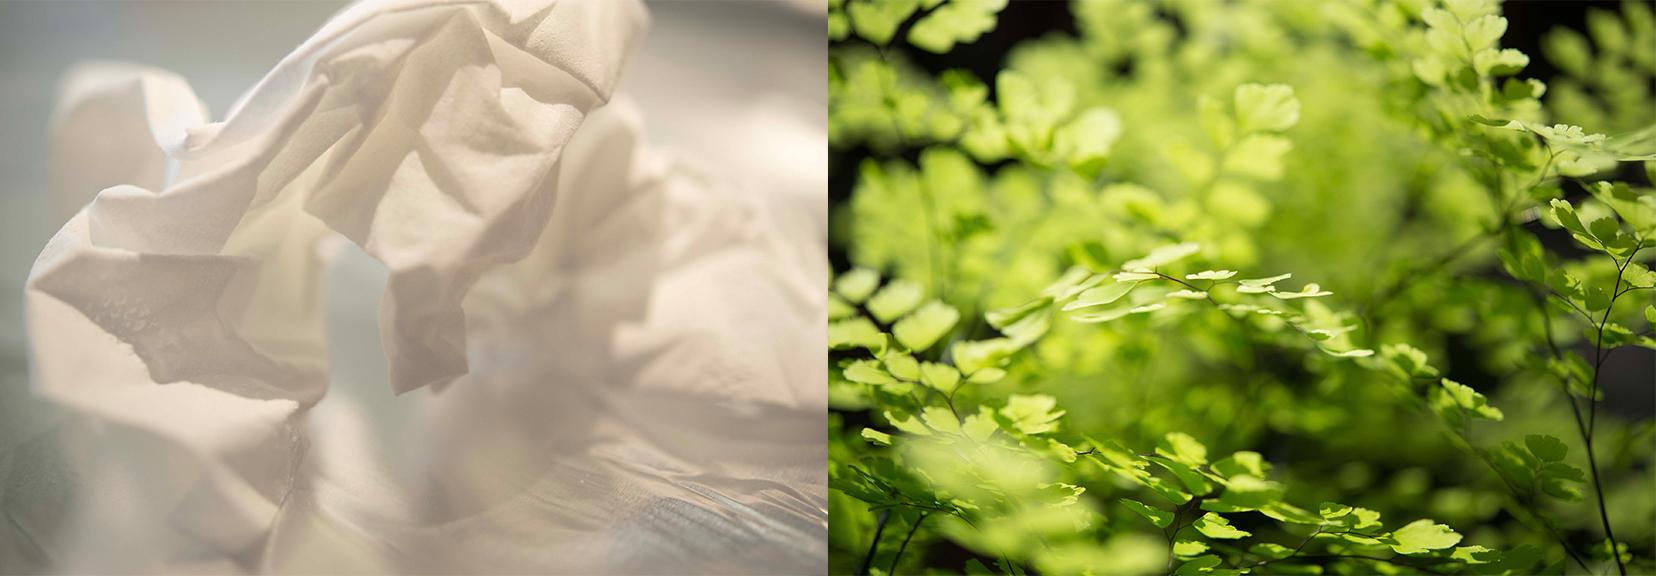 Tissue-Greenery.jpg